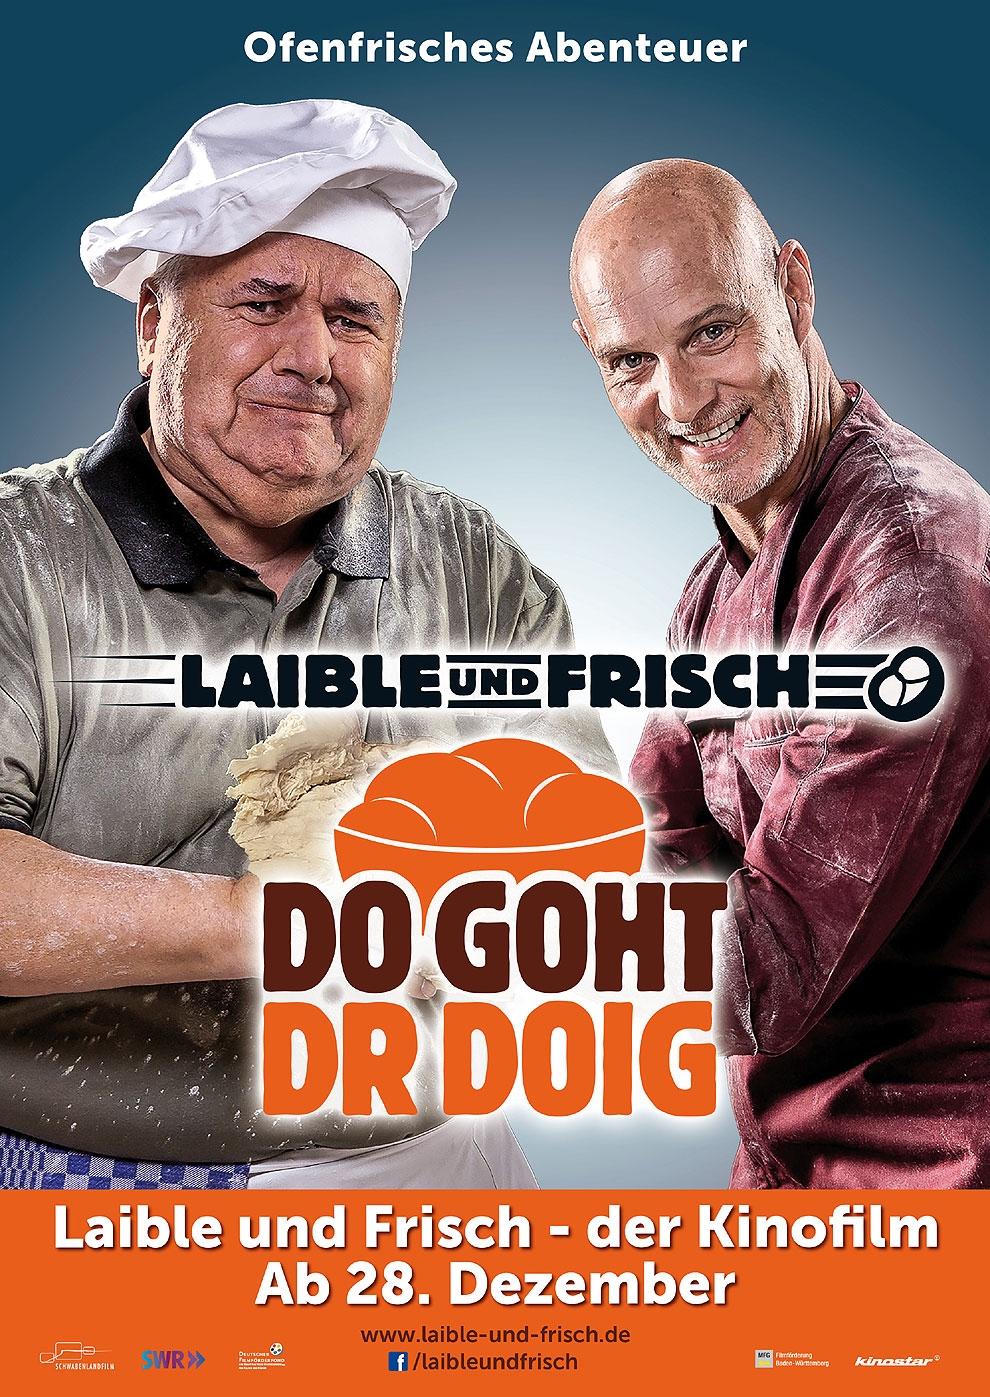 Laible und Frisch - Do Goht Dr Doig (Poster)